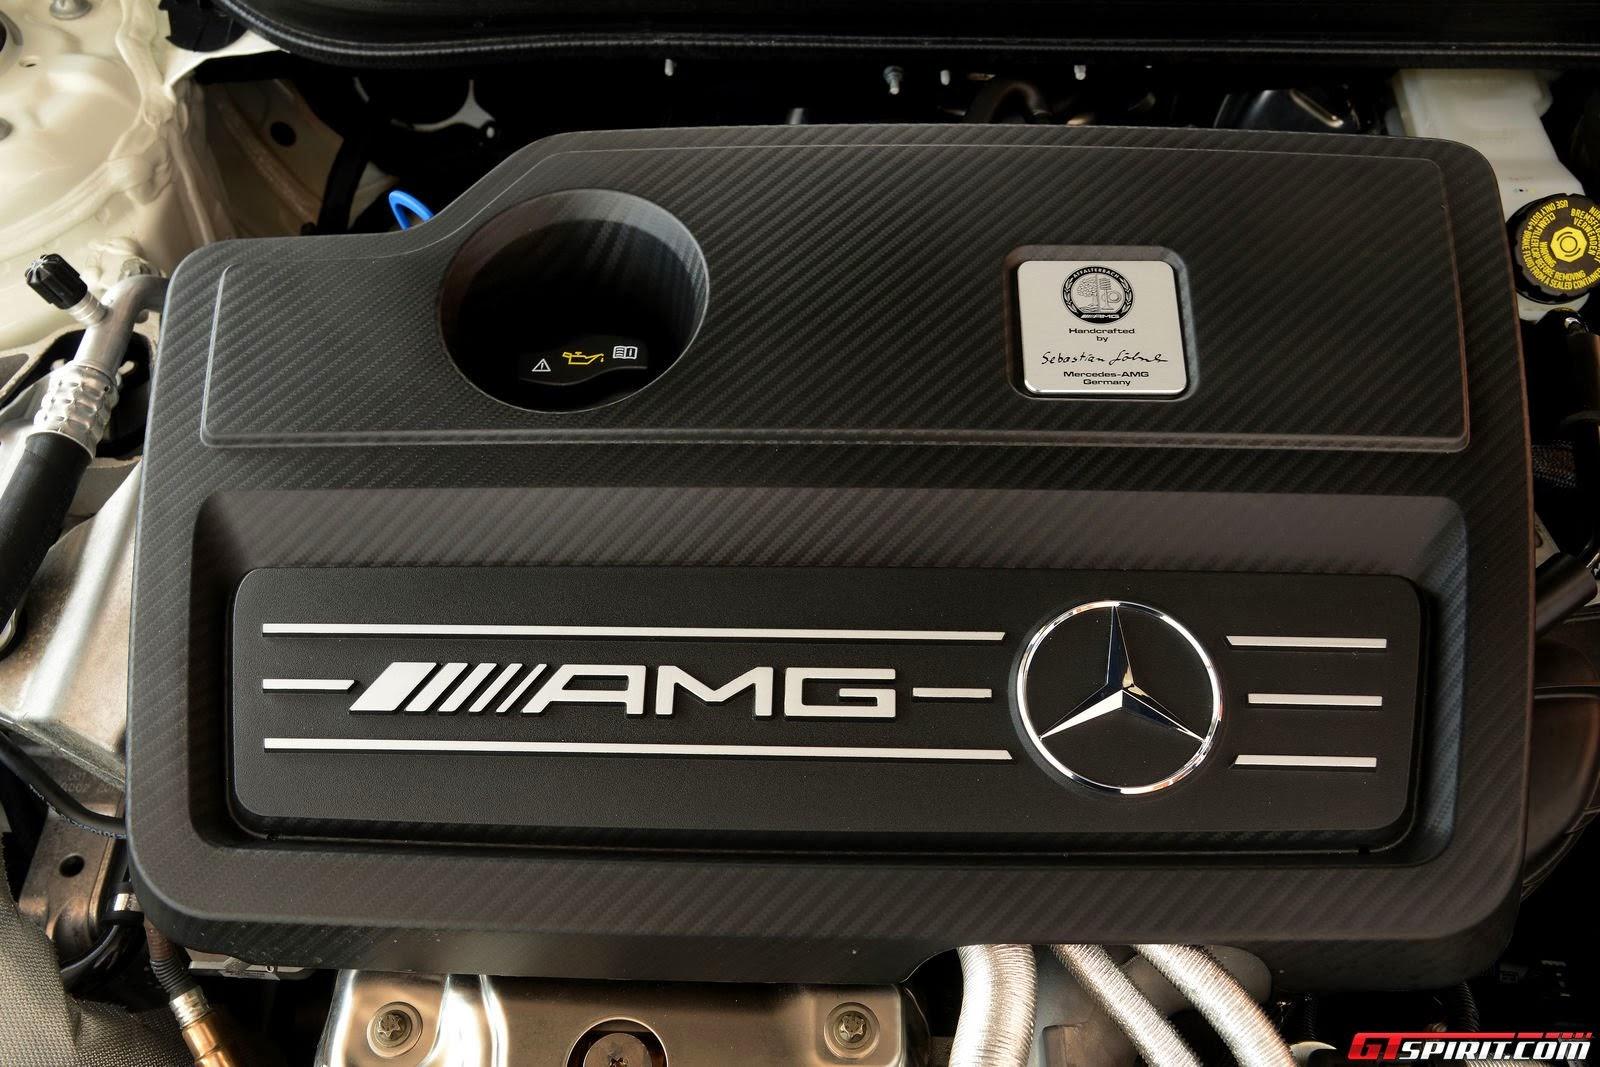 2015 Mercedes-Benz GLA 45 AMG Nimble and dynamic